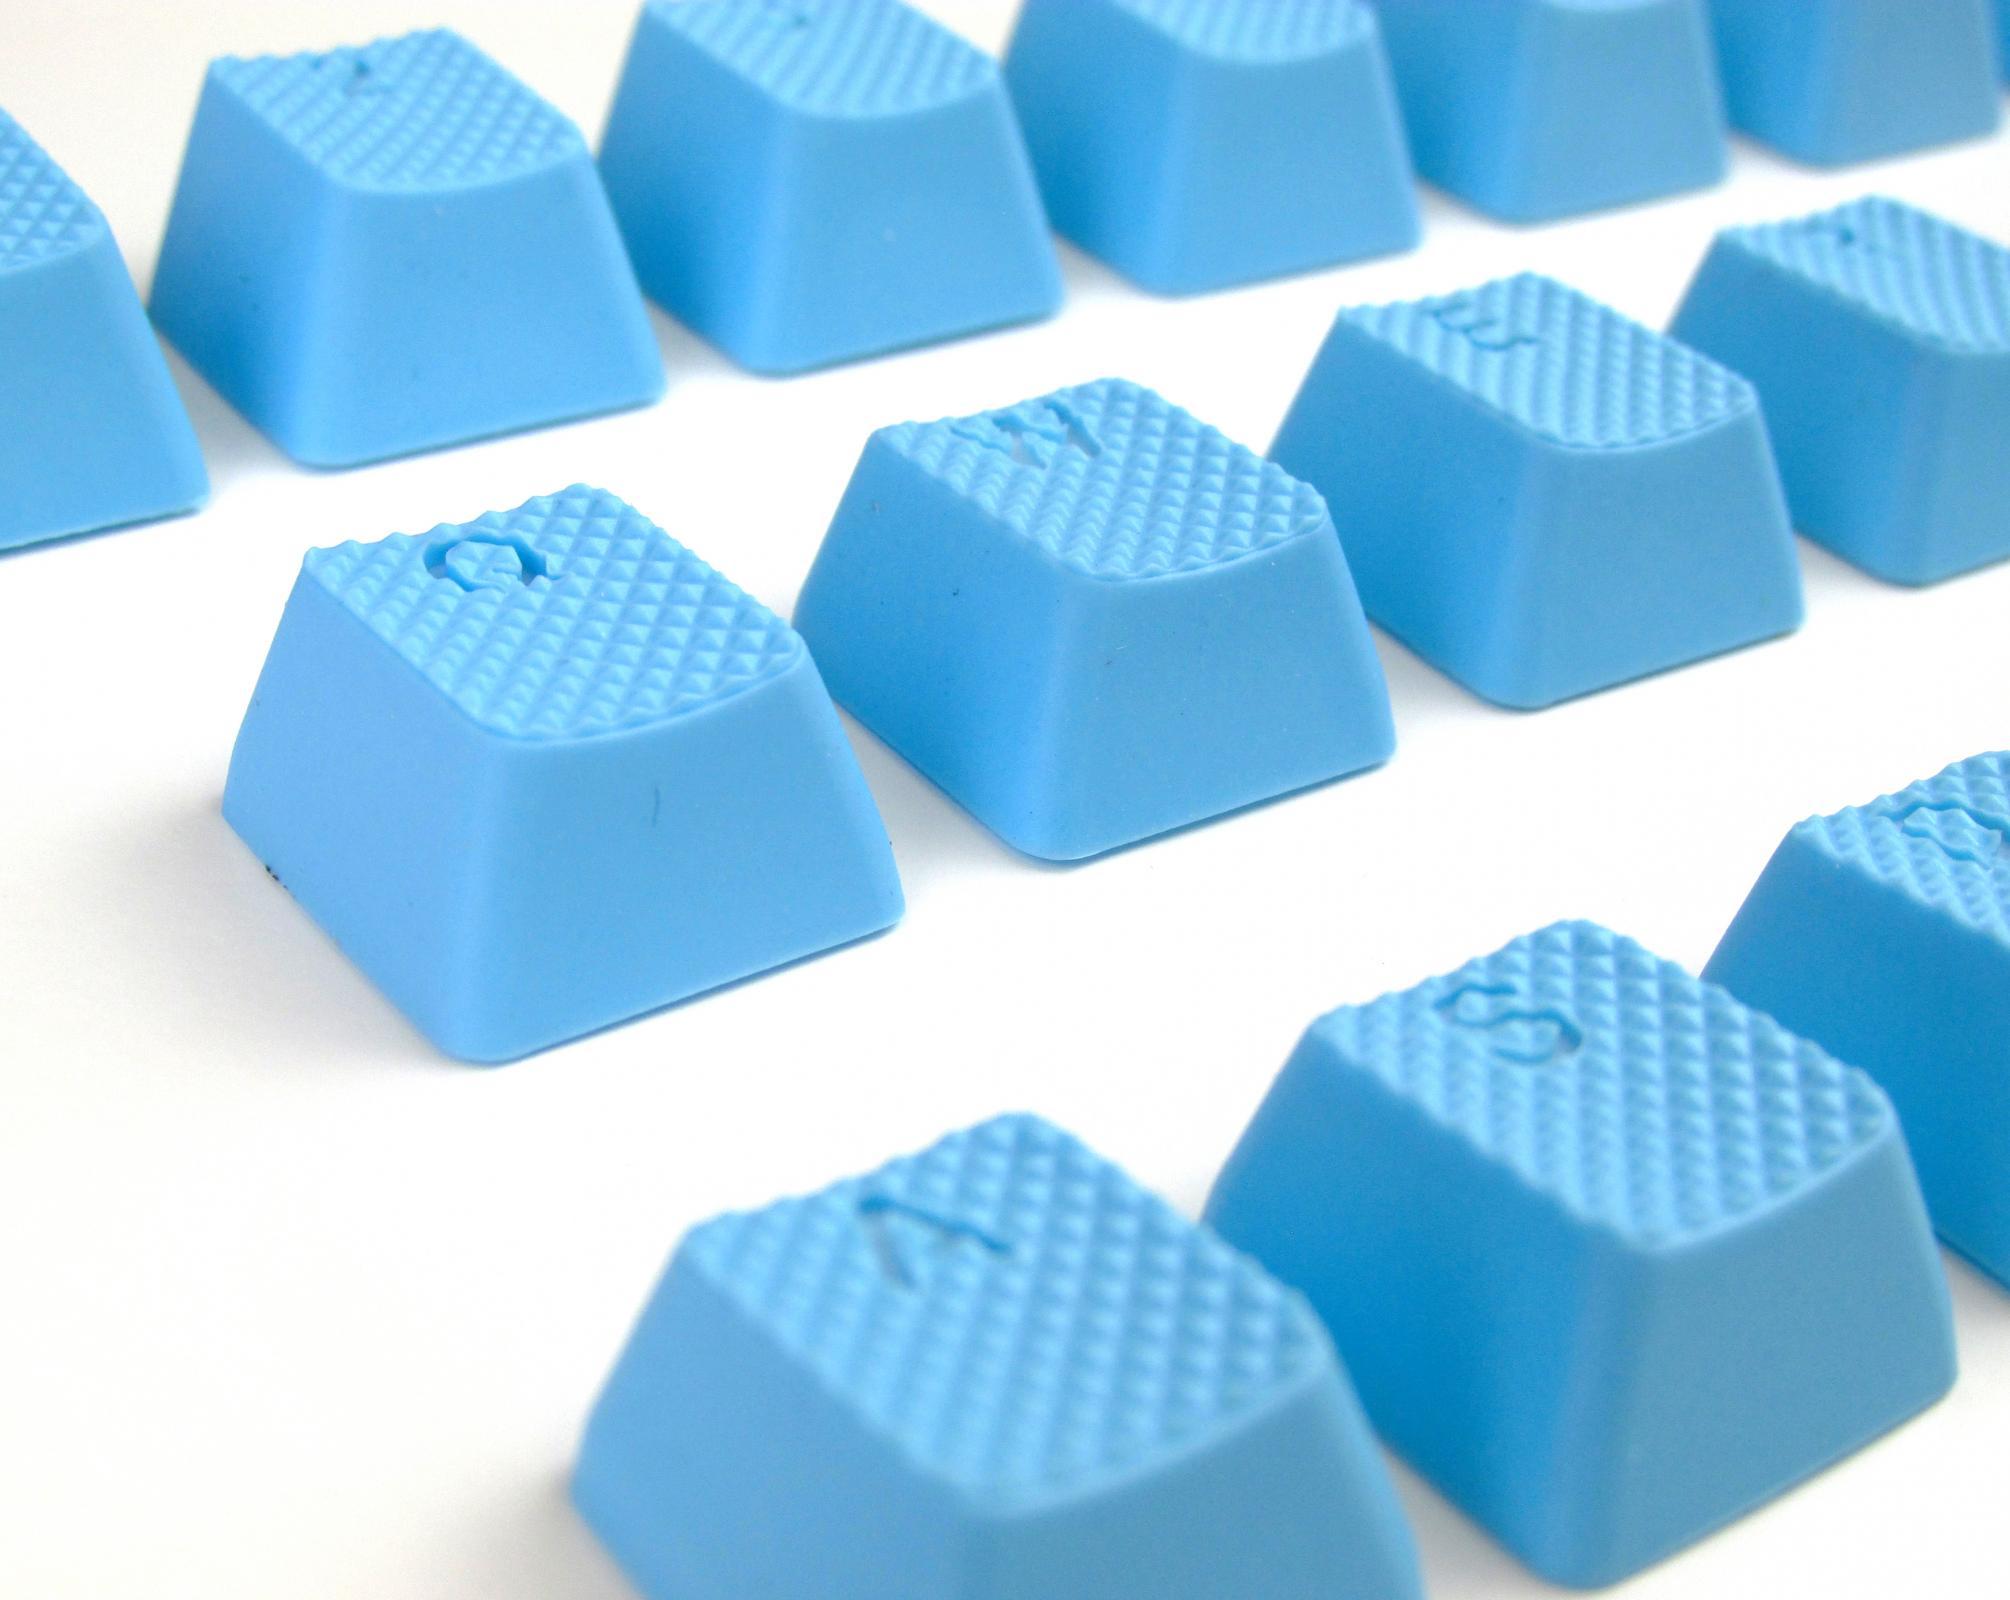 18-Key TPR Backlit Double Shot Keycap Set - Neon Blue (Tai-Hao)